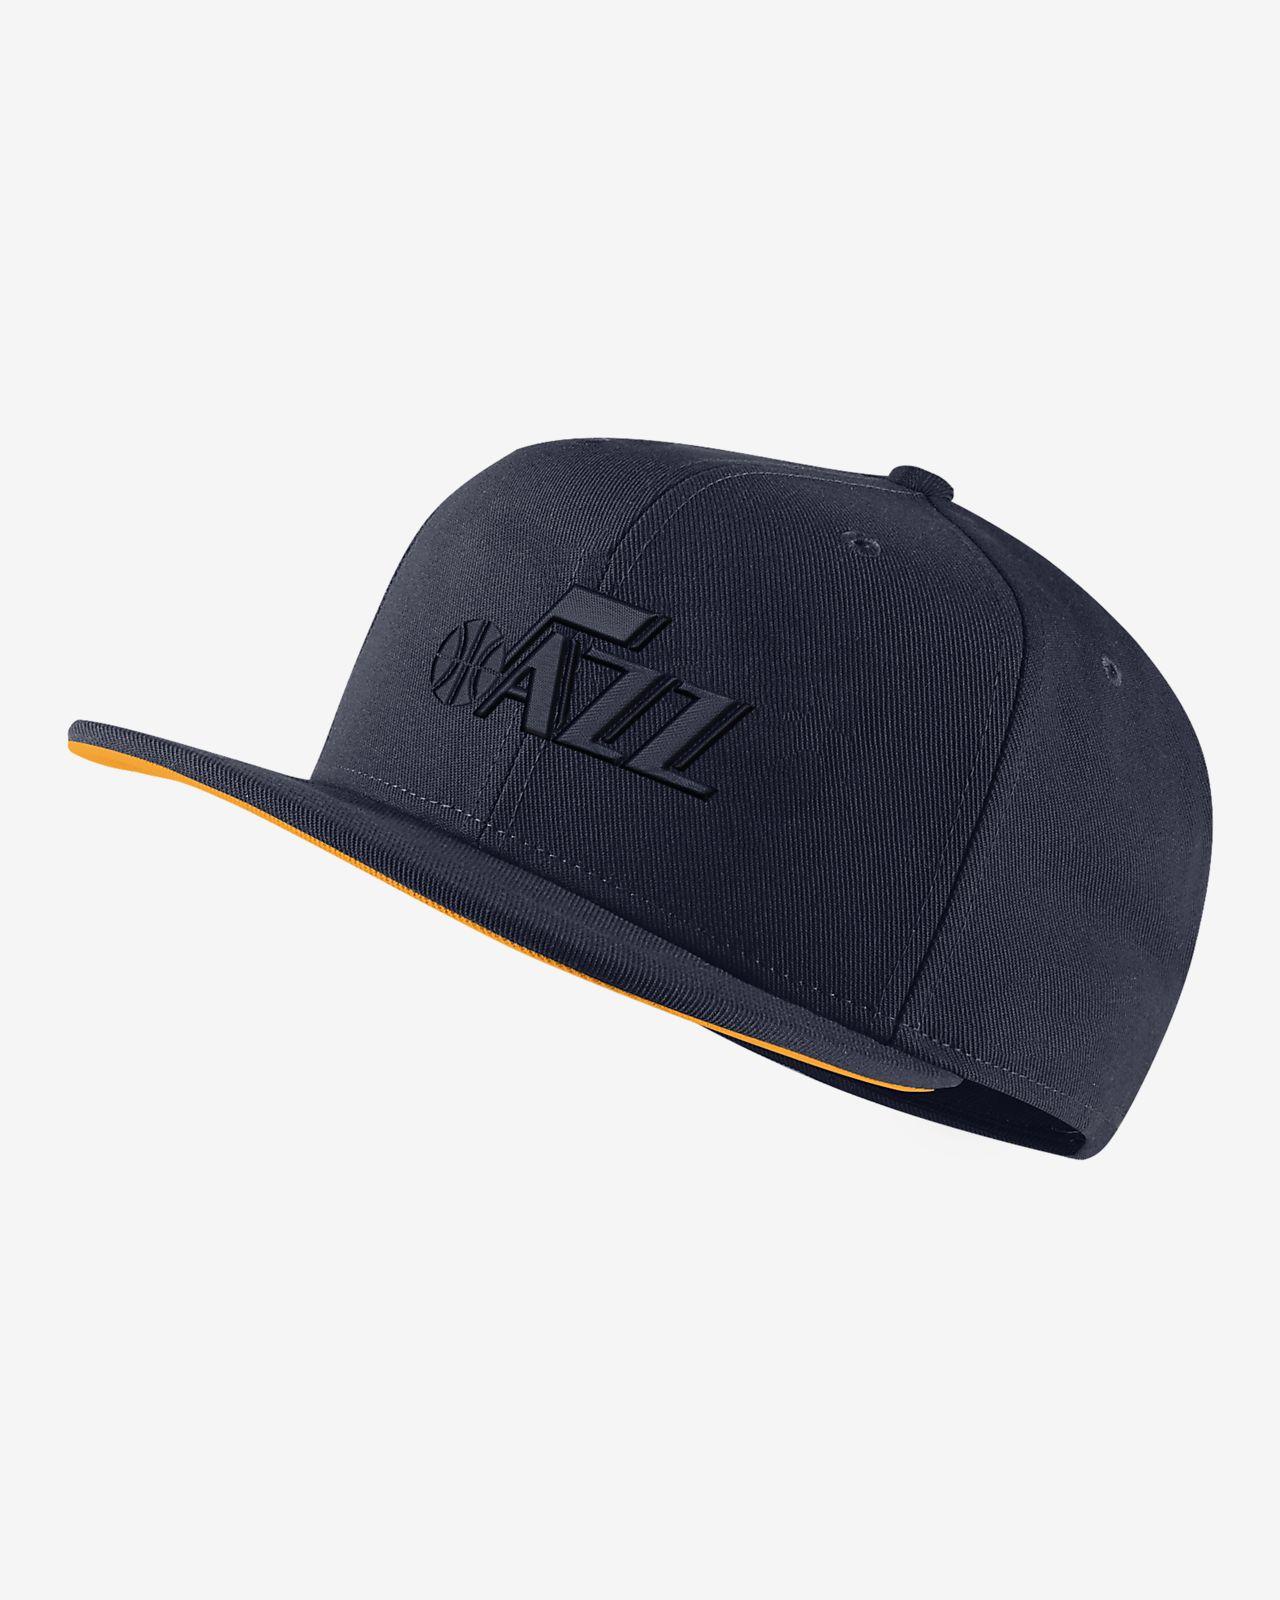 Utah Jazz Nike AeroBill NBA Hat